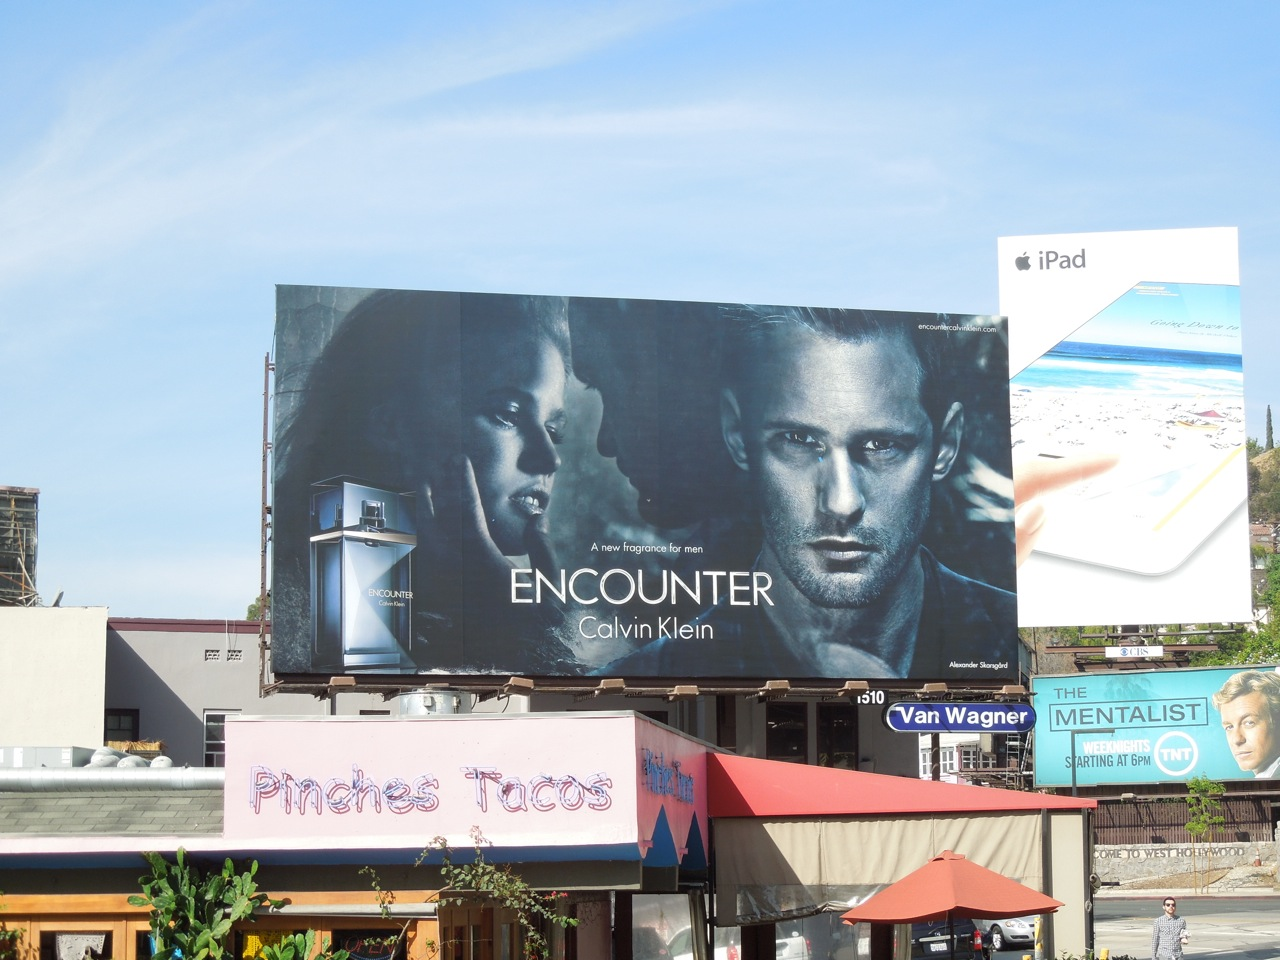 http://2.bp.blogspot.com/-gShyUIk2sjs/UGJIVOqwqzI/AAAAAAAA018/-YKoQZay7eI/s1600/calvinklein+encounter+fragrance+billboard.jpg